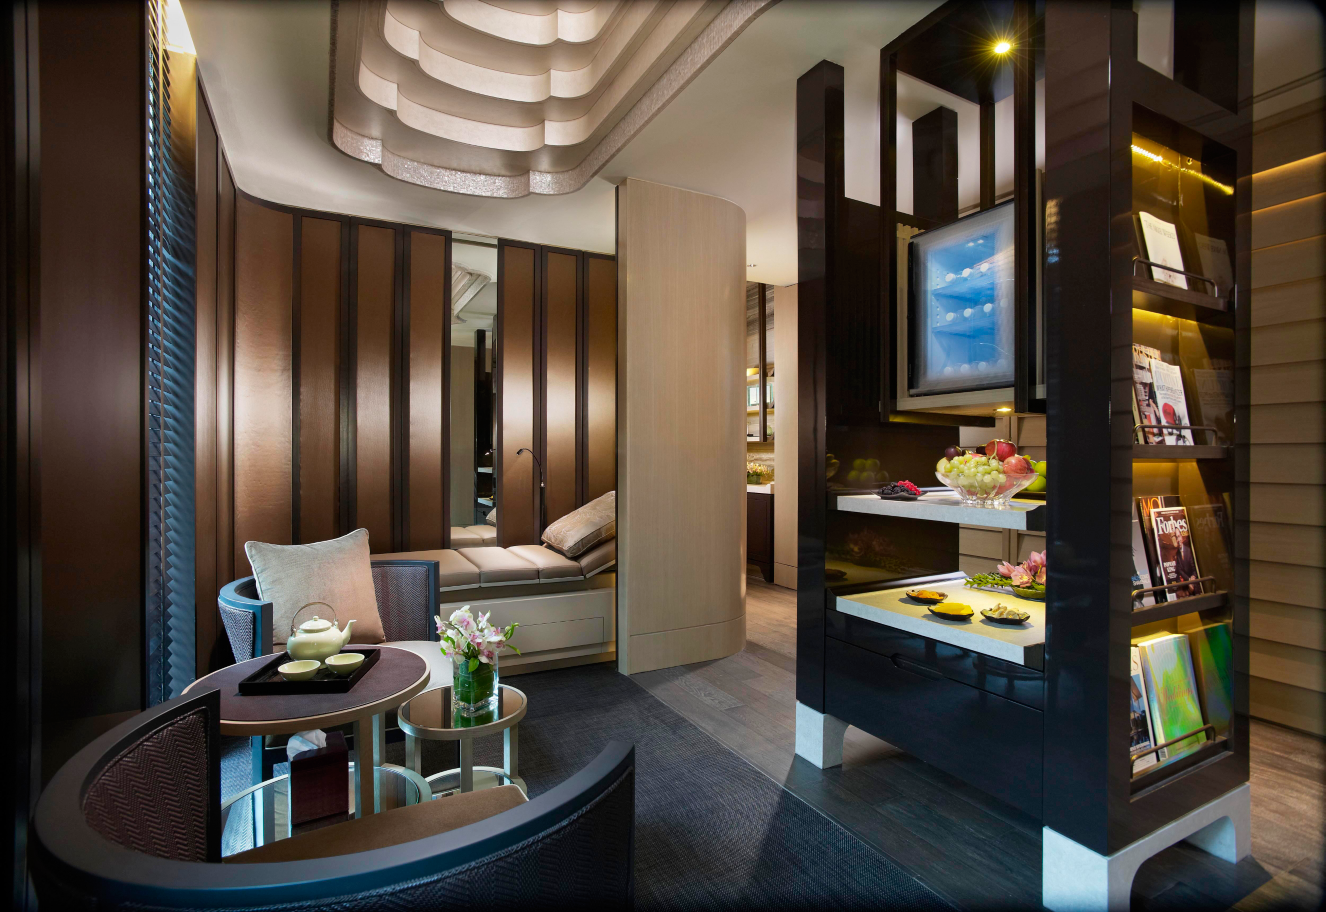 The Spa At Mandarin Oriental Singapore Mandarin Oriental Mandarin Oriental Hotel Spa Rooms